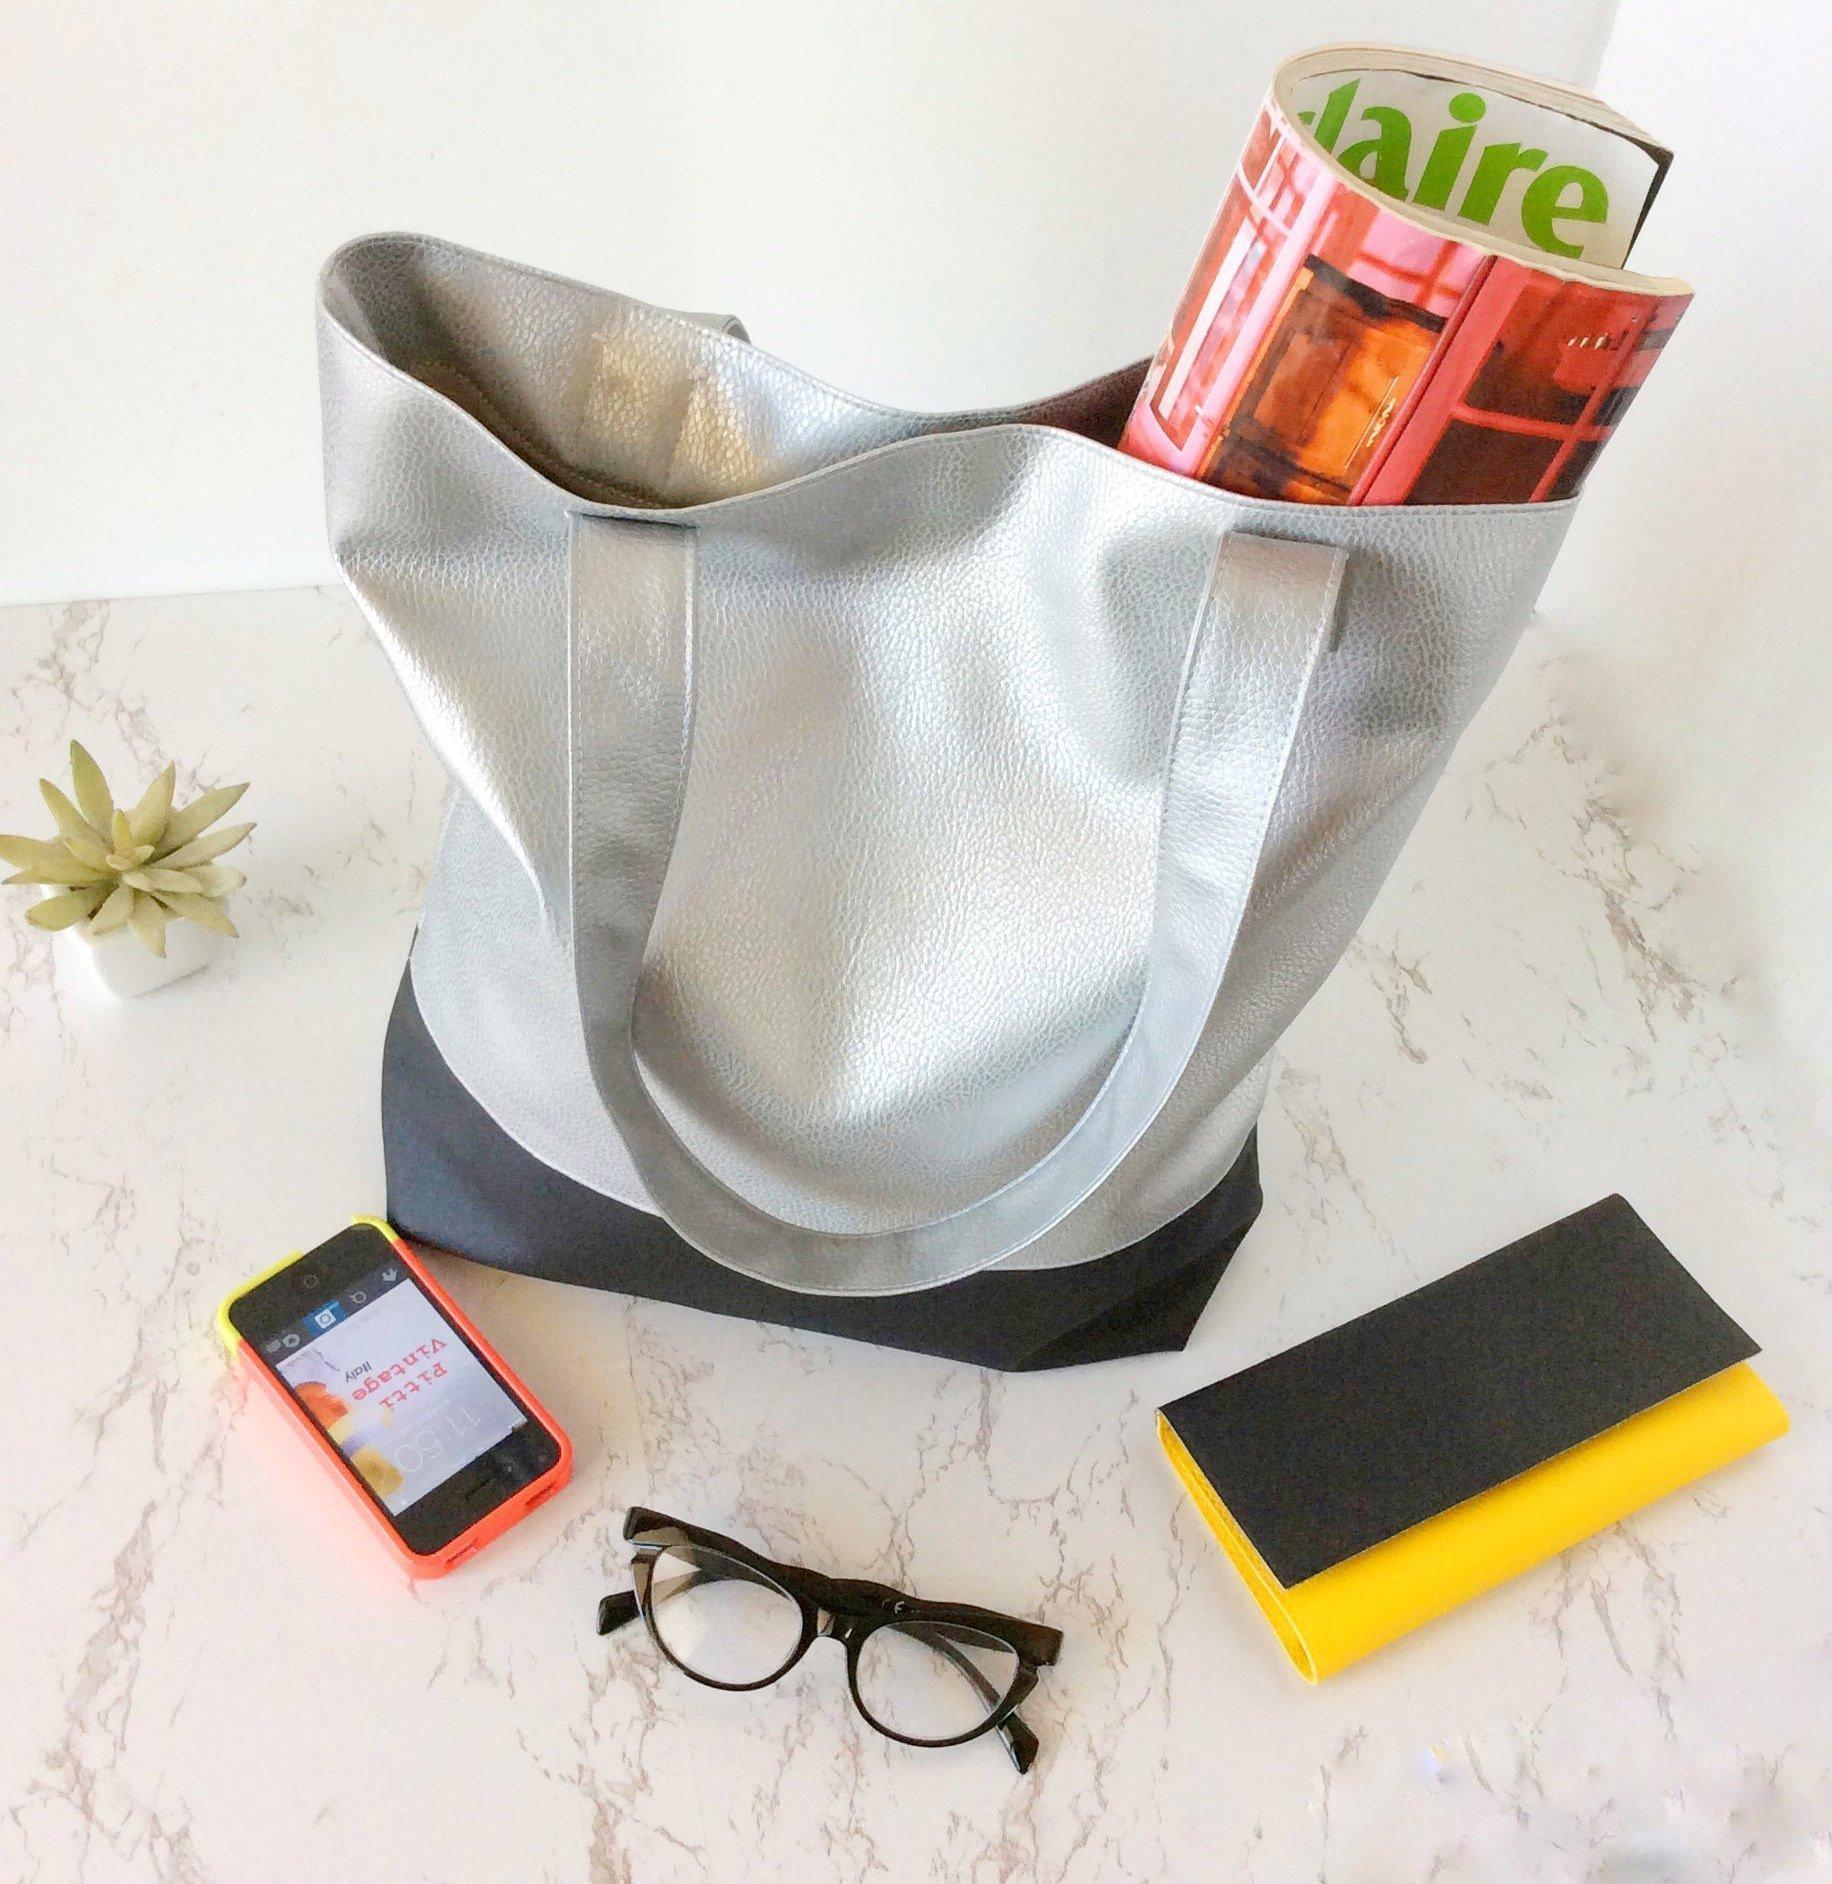 Minimalist silver tote bag vegan shopping shopper for back to school work travel Handmade in Italy - handmade-bags